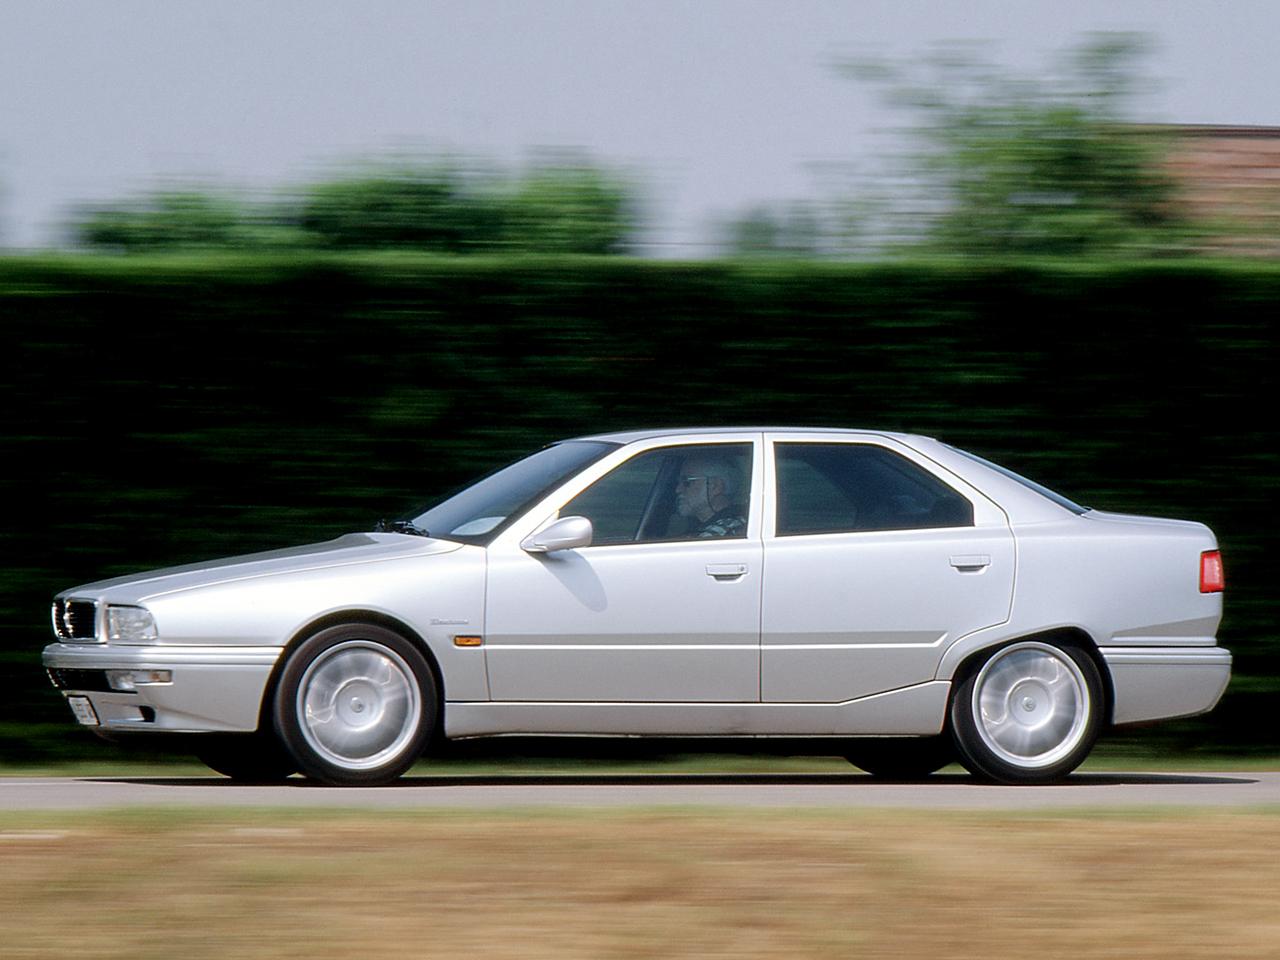 Maserati Ghibli Price >> Maserati price £10k - it's real! - Drive